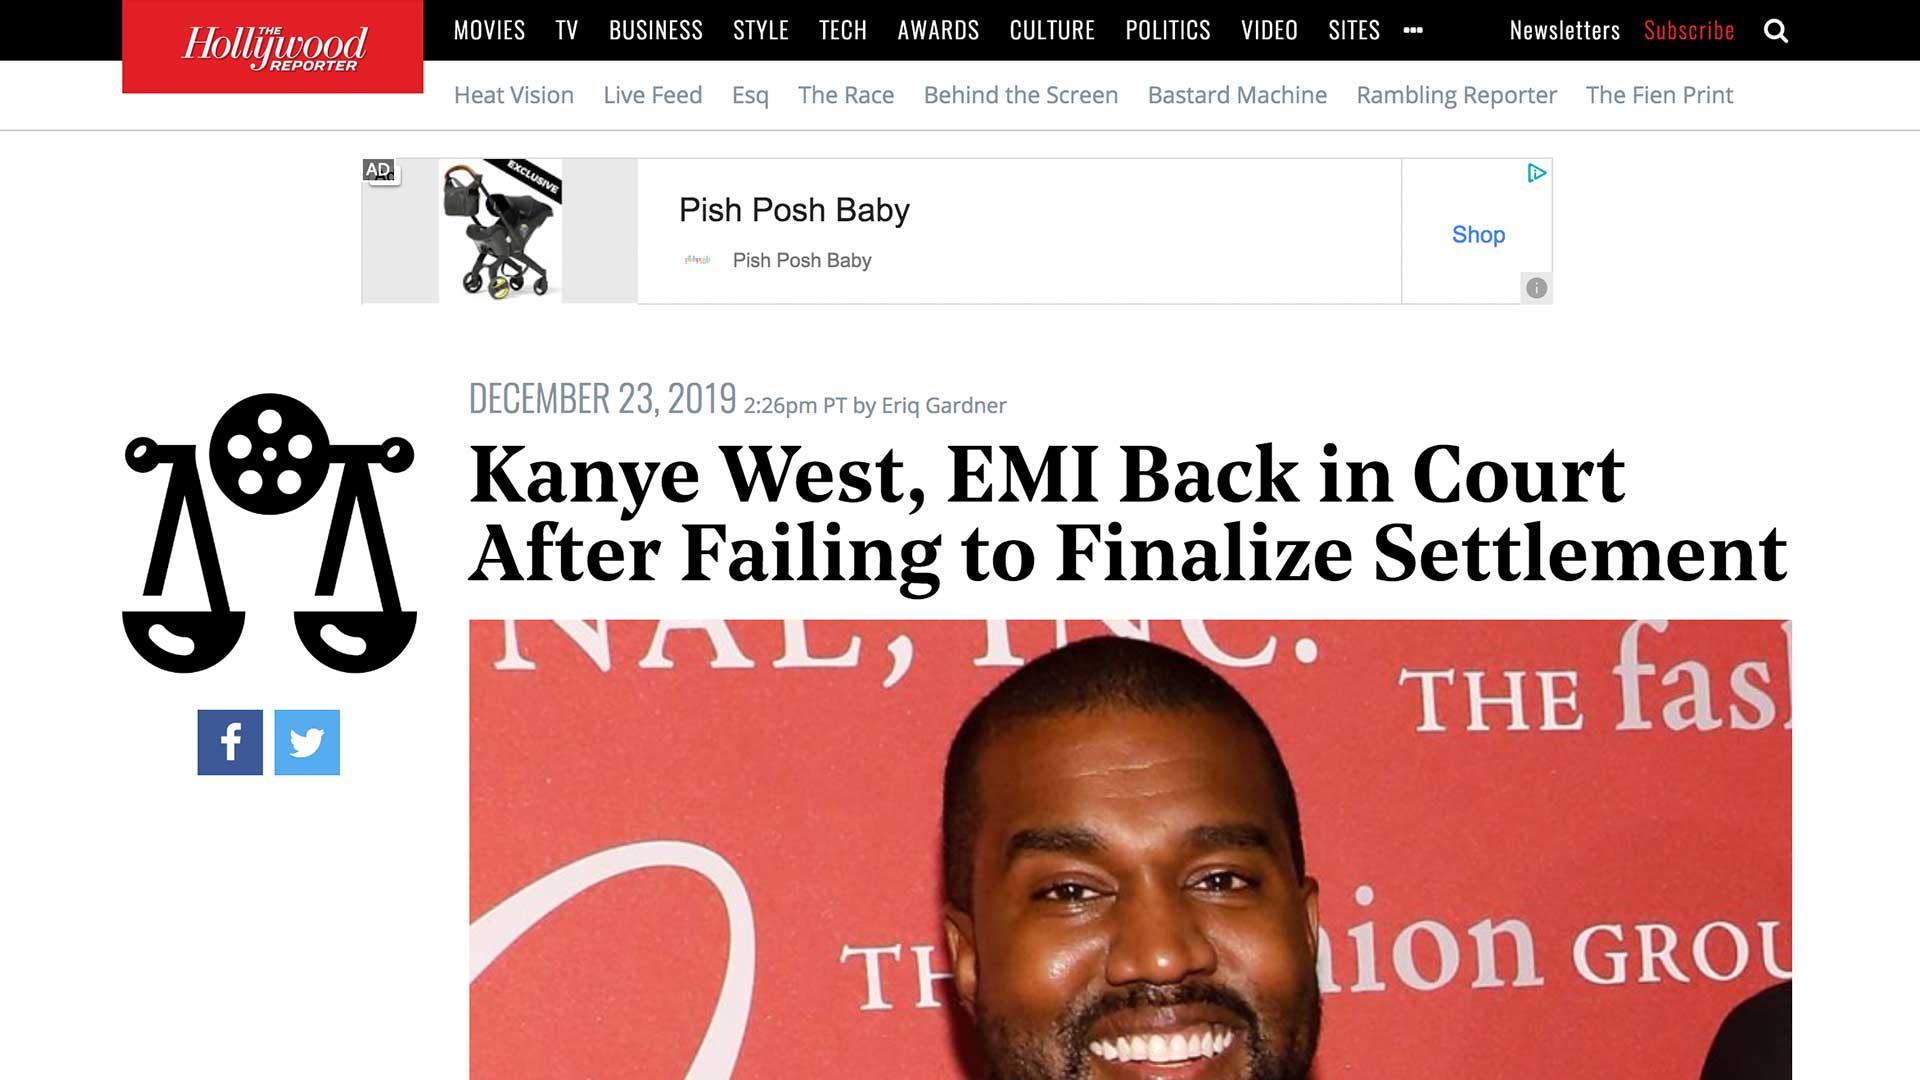 Fairness Rocks News Kanye West, EMI Back in Court After Failing to Finalize Settlement